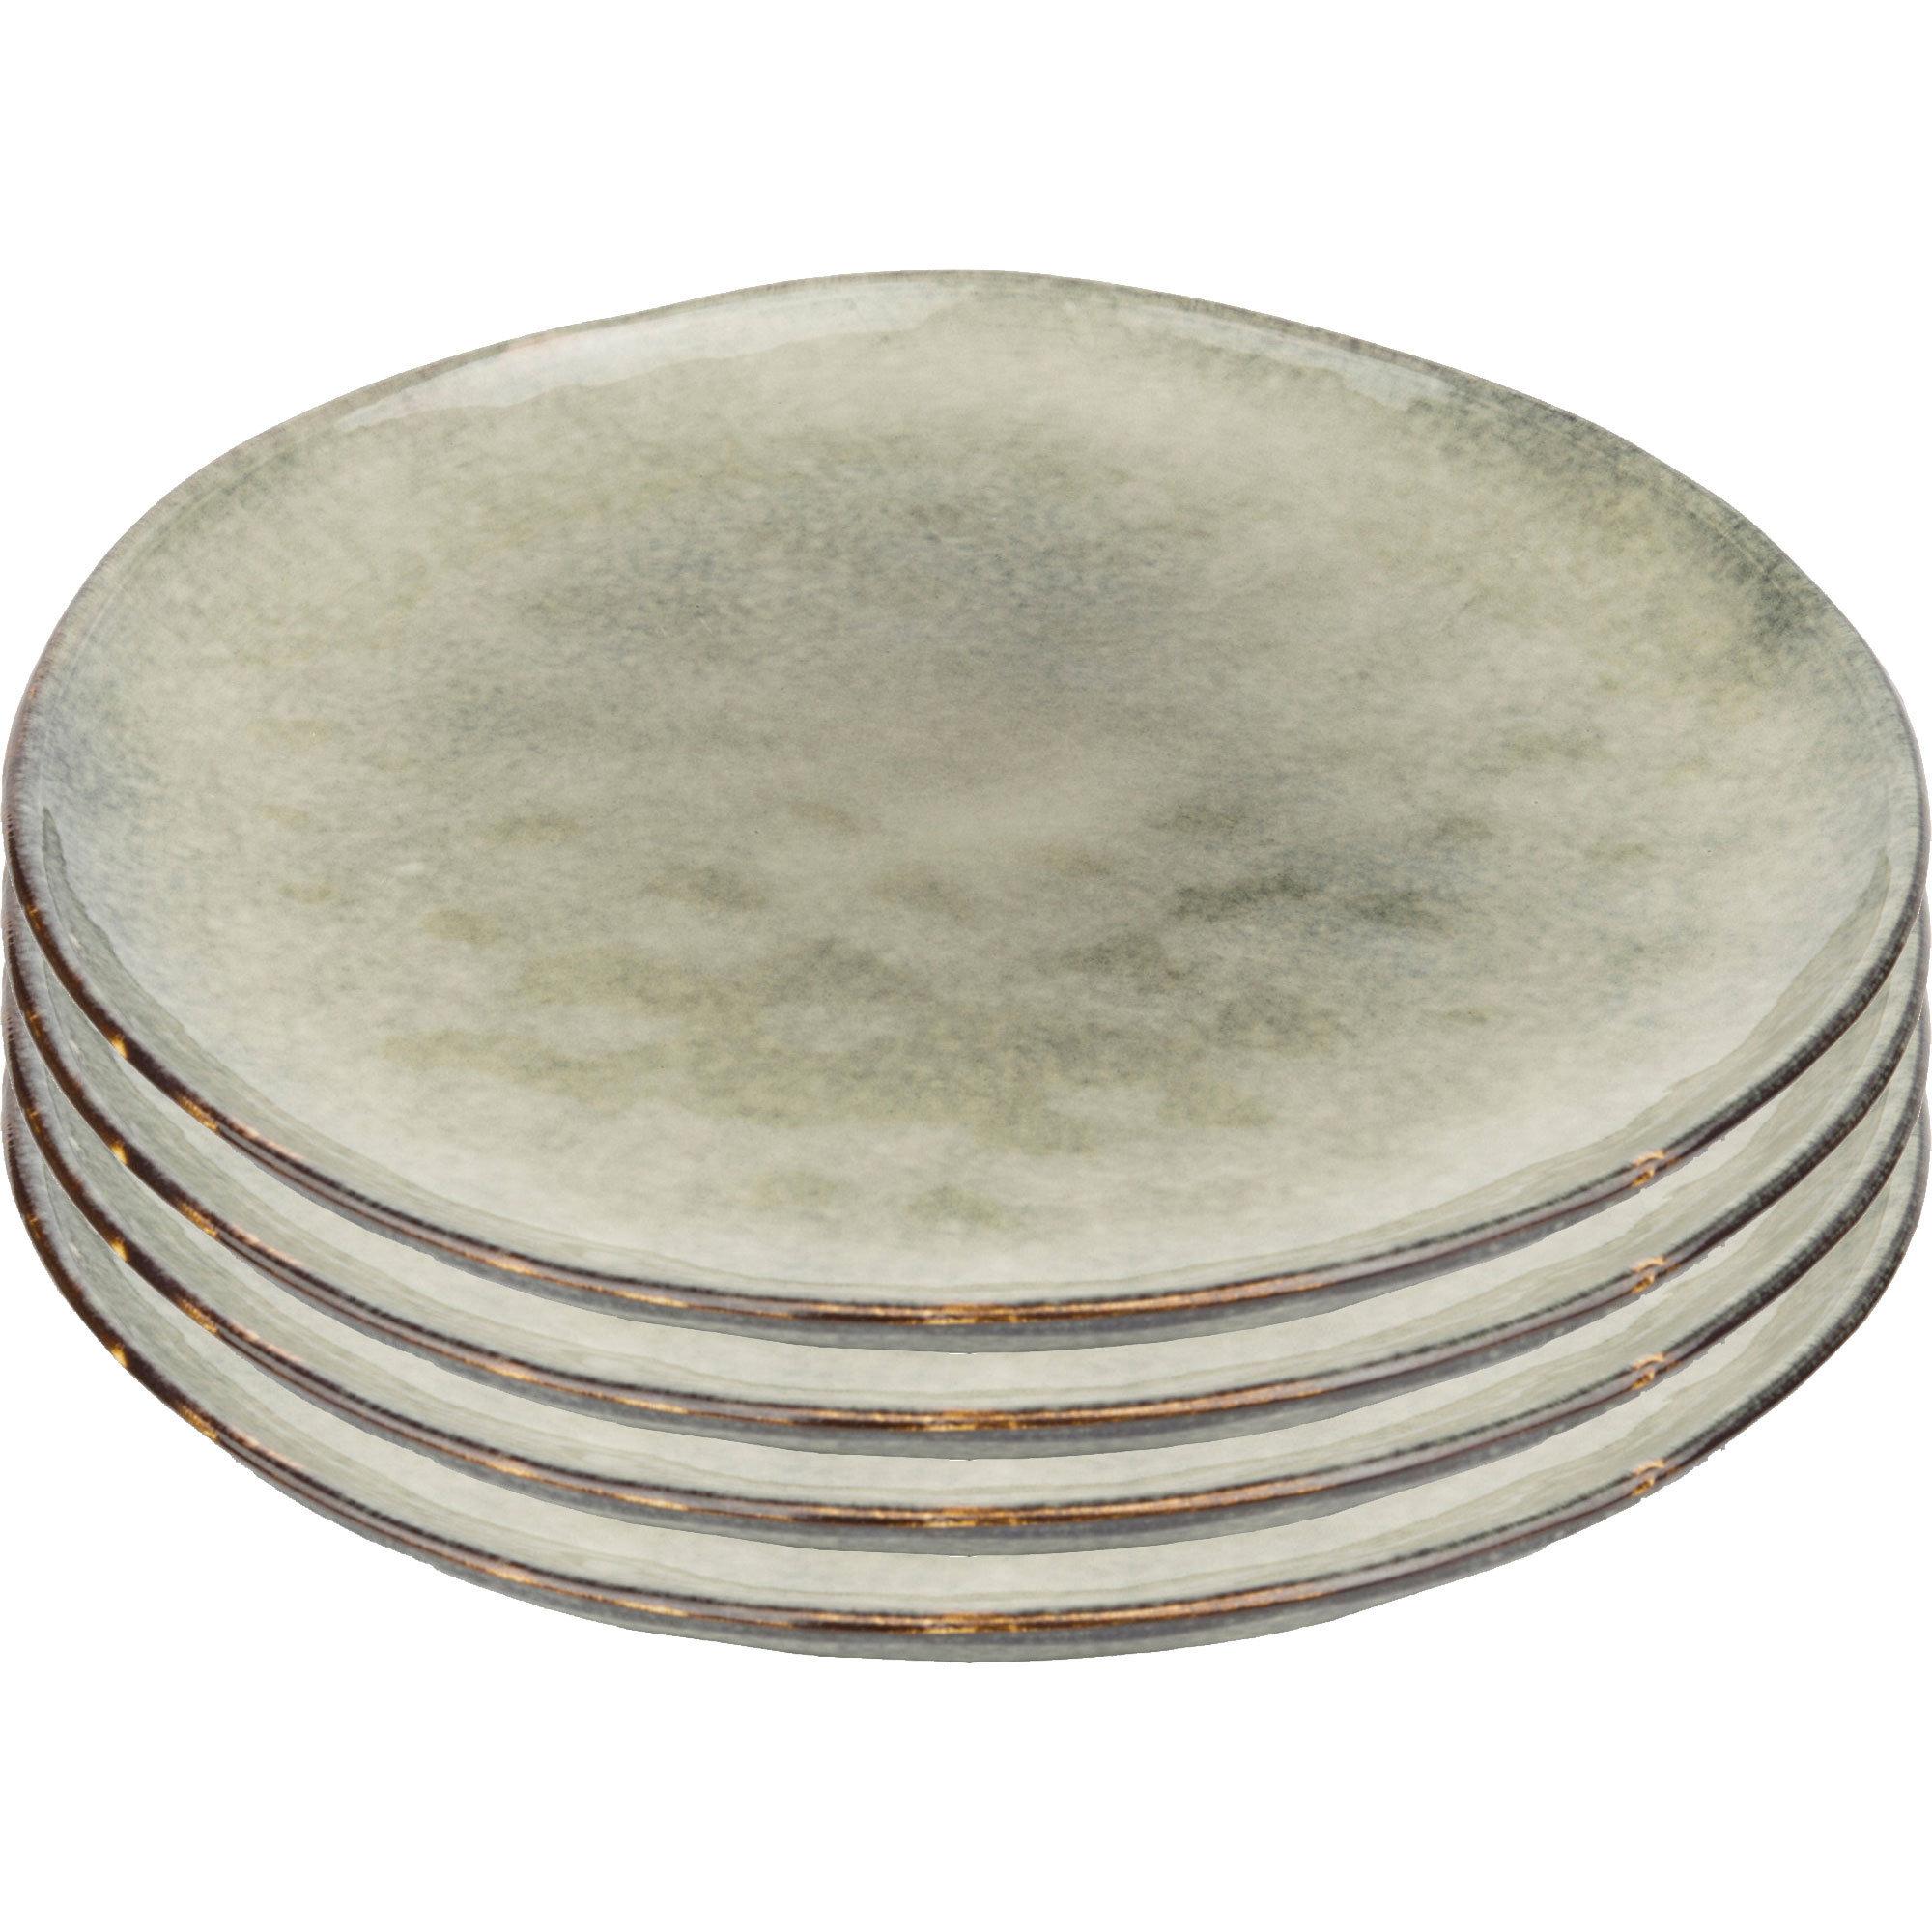 Mareld Odd tallrik 28 cm 4-pack – Saltvatten